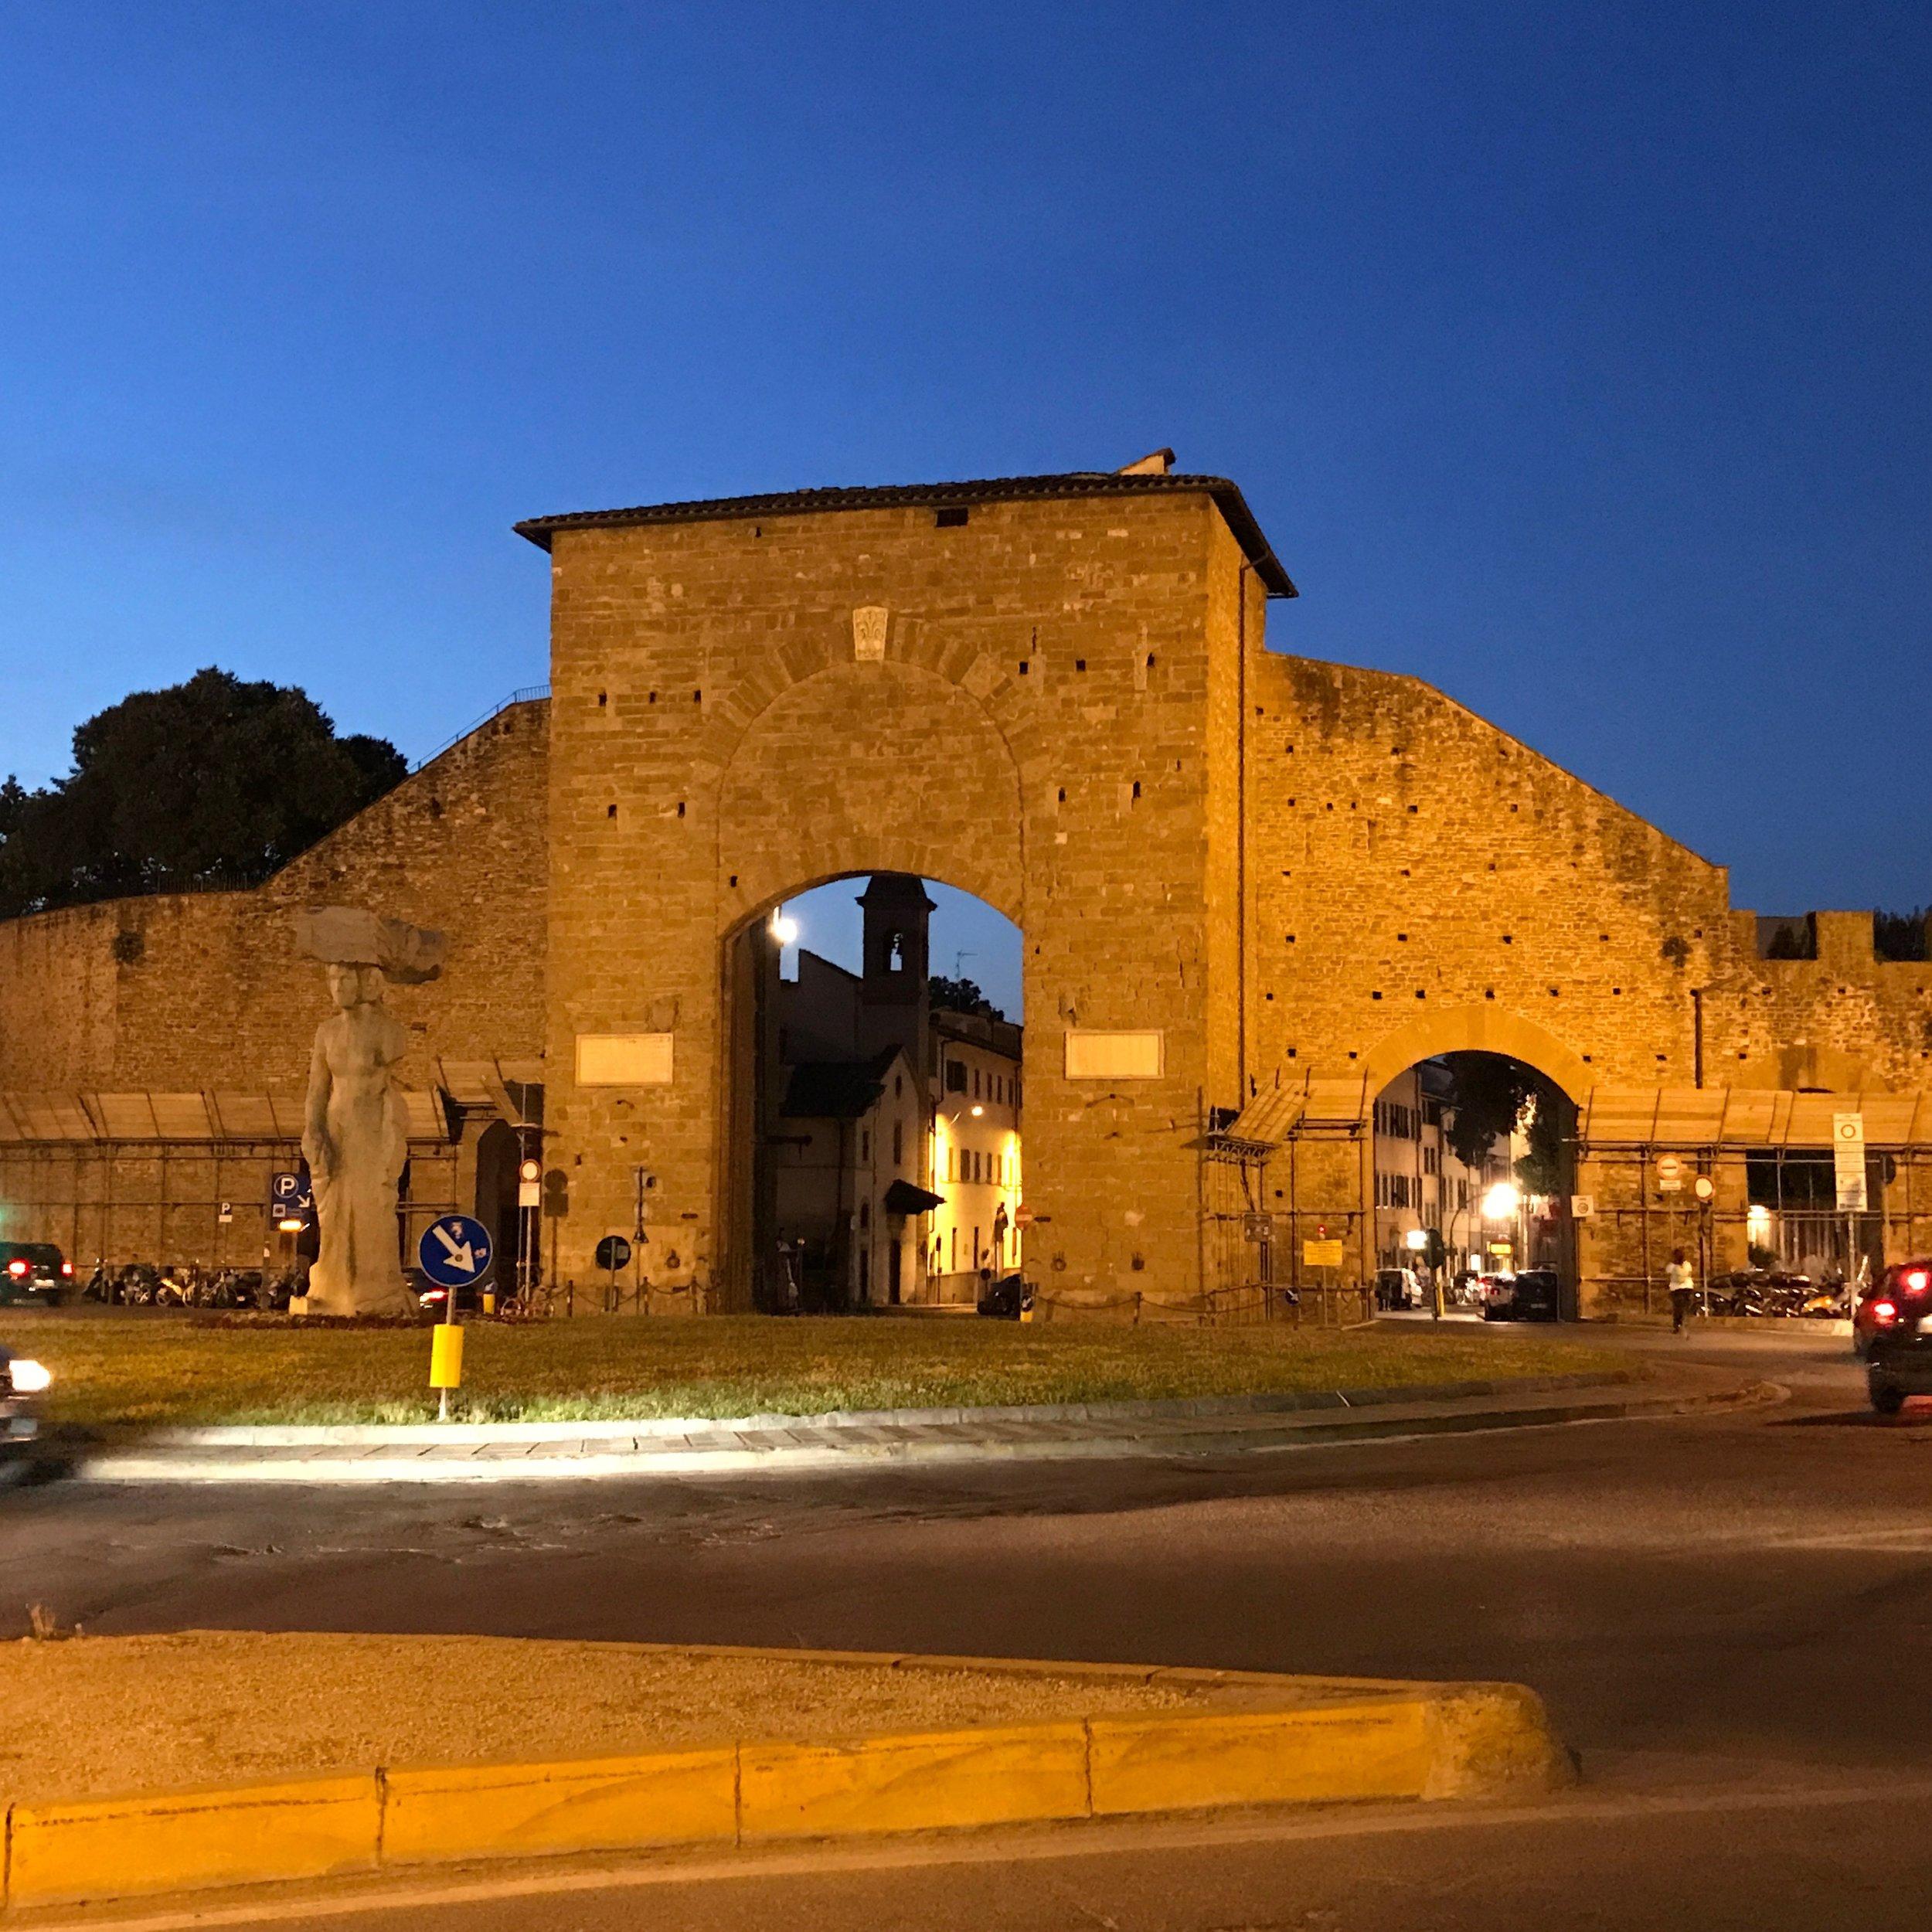 Porta Romana, the Florentine gate toward Rome